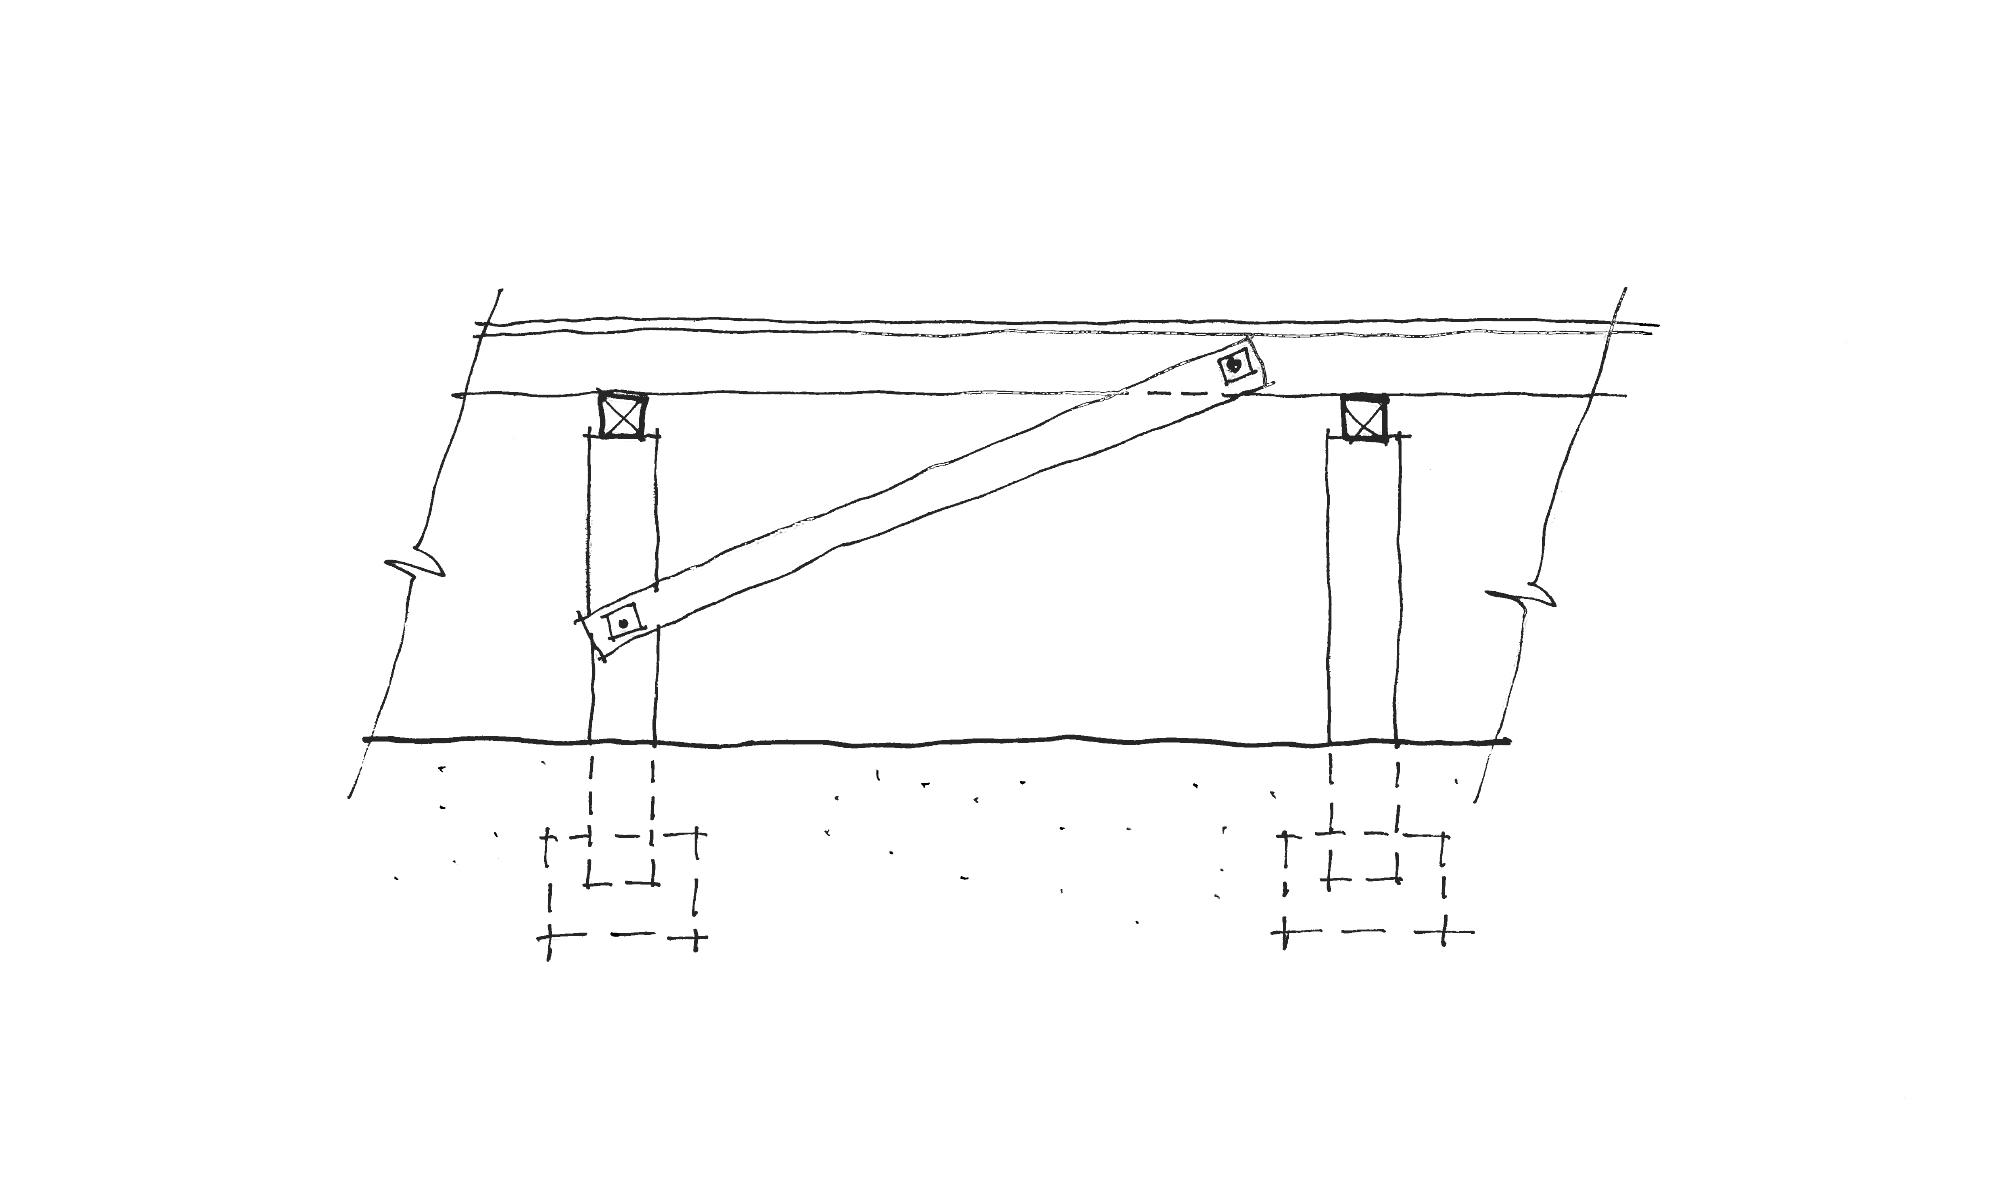 hight resolution of diagonal timber brace